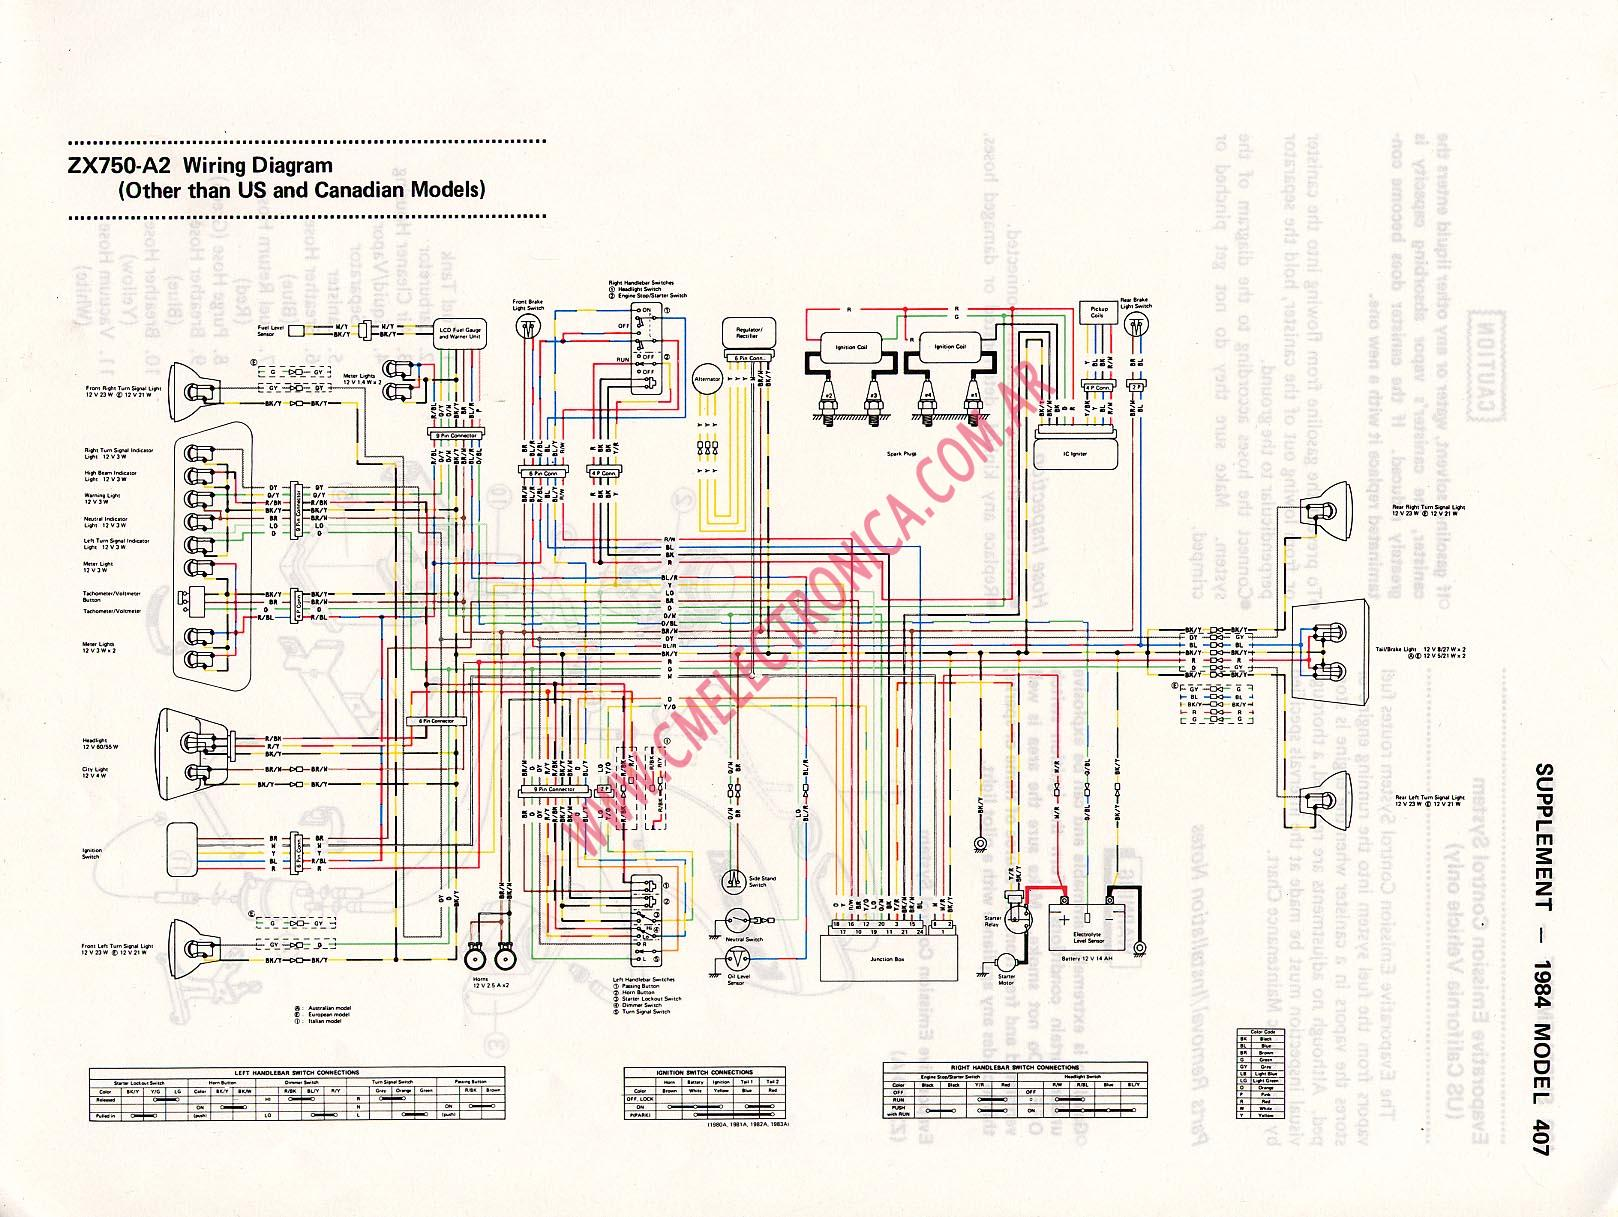 kawasaki gpz750r?resize\\=1618%2C1217 100 [ 2006 kawasaki zzr 600 service manual ] zzr 400 wiring diagram at soozxer.org